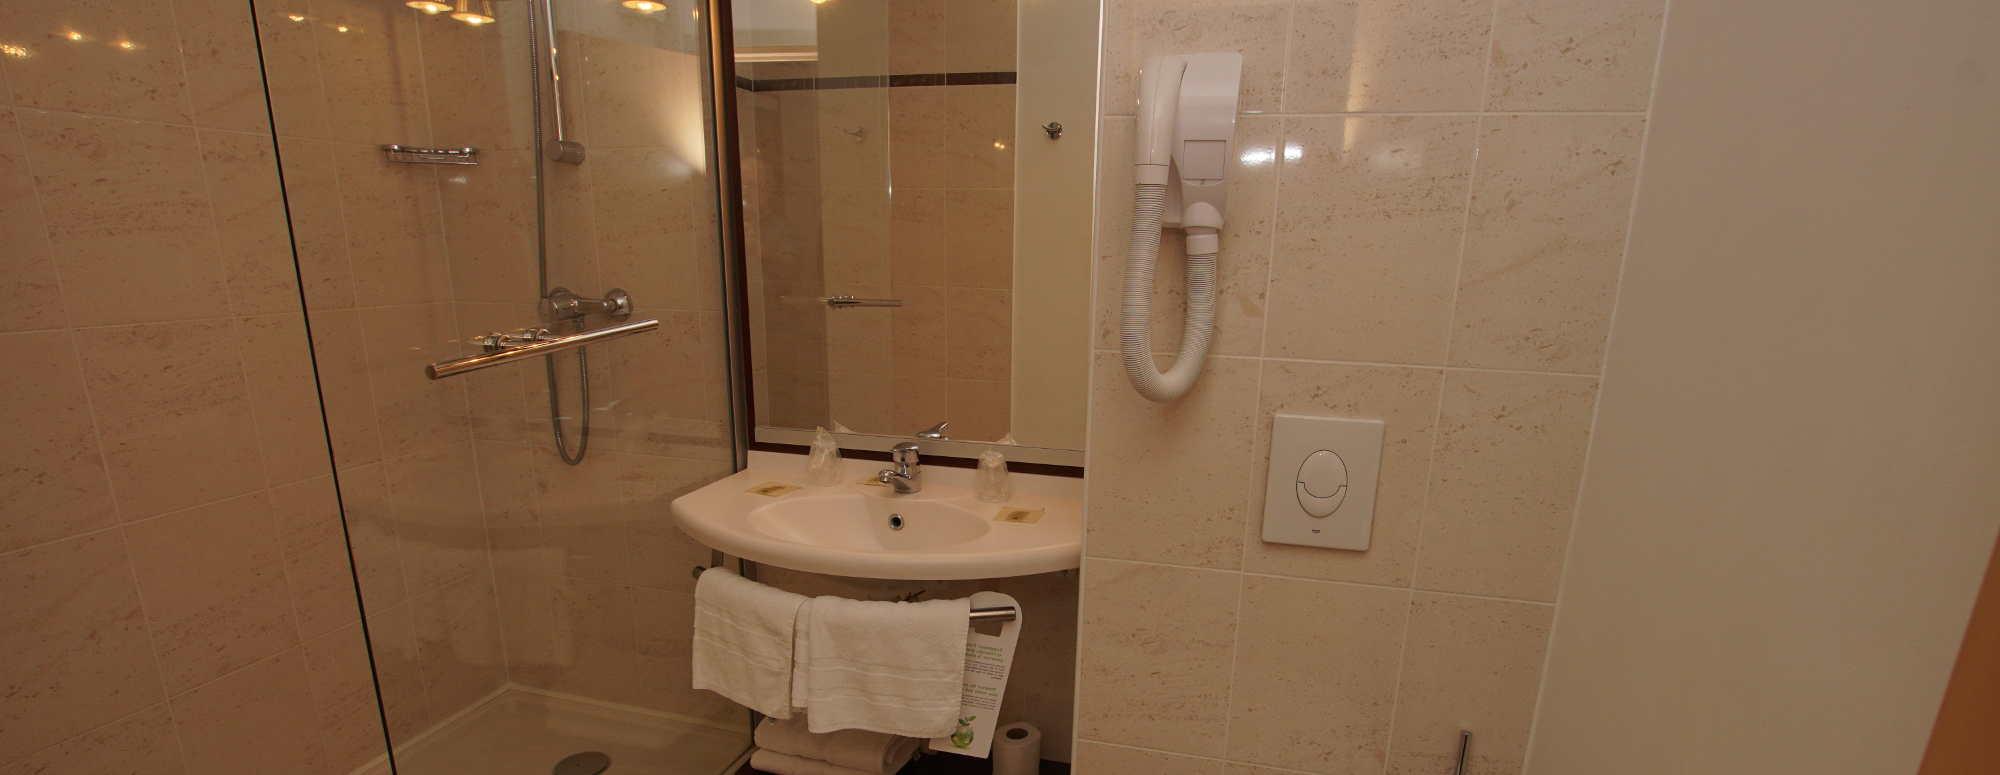 Salle de bain de la chambre salon